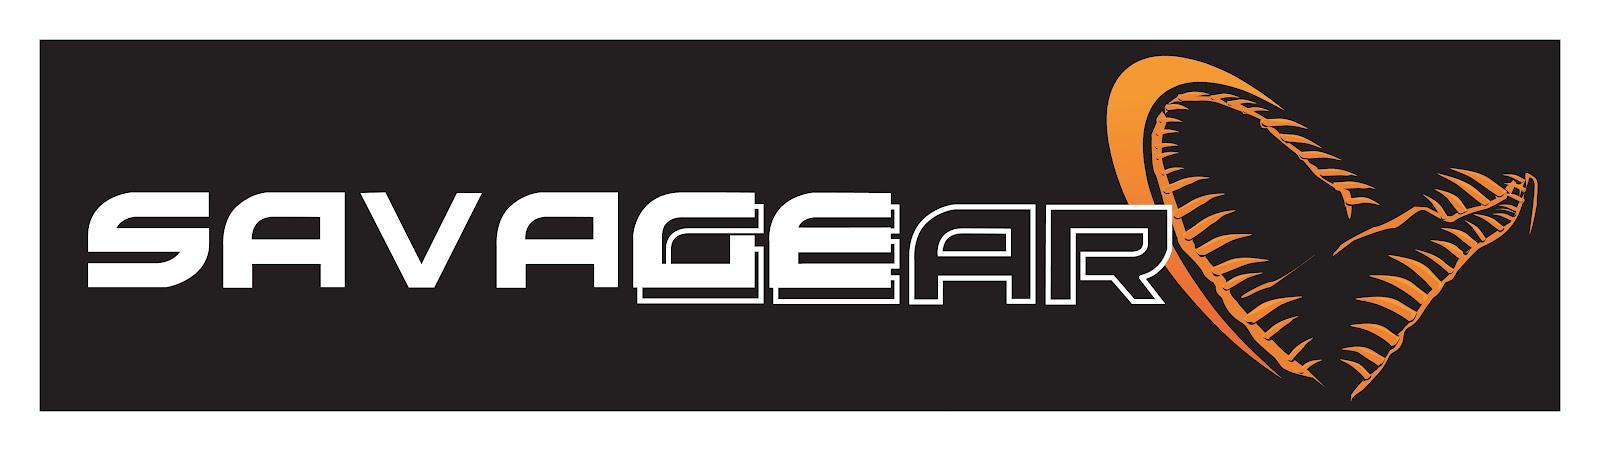 Savage Gear logotyp